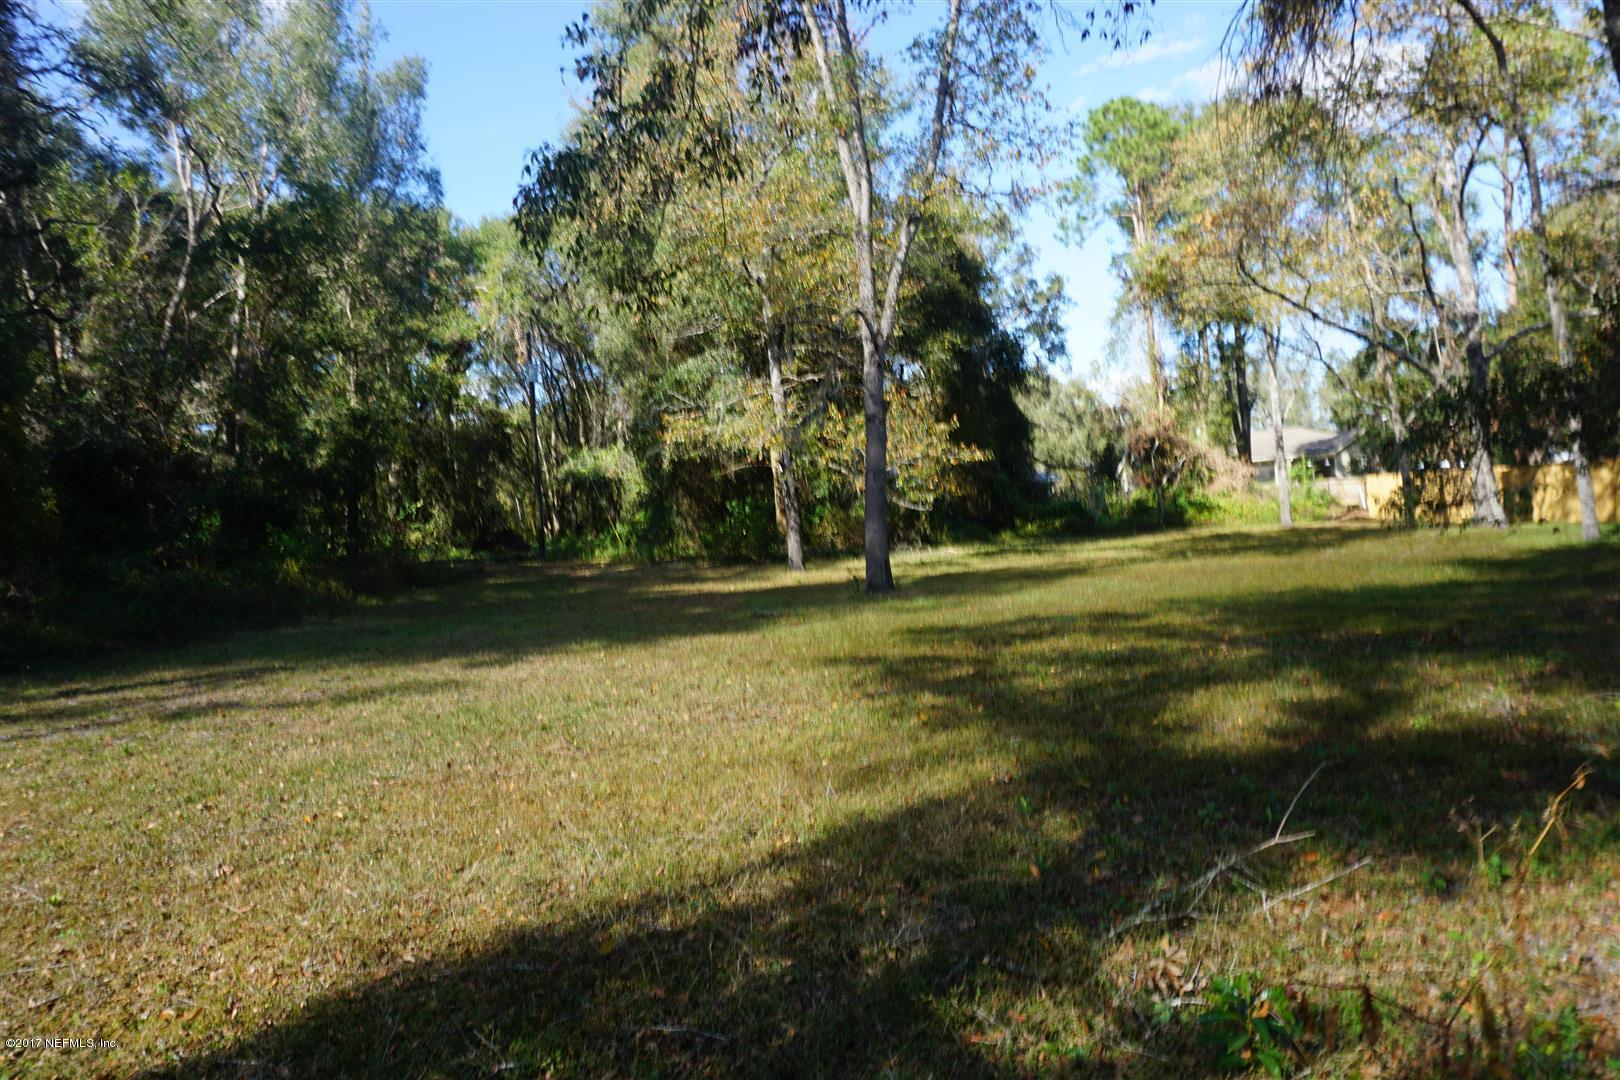 0000 BAKER, KEYSTONE HEIGHTS, FLORIDA 32656, ,Vacant land,For sale,BAKER,910046